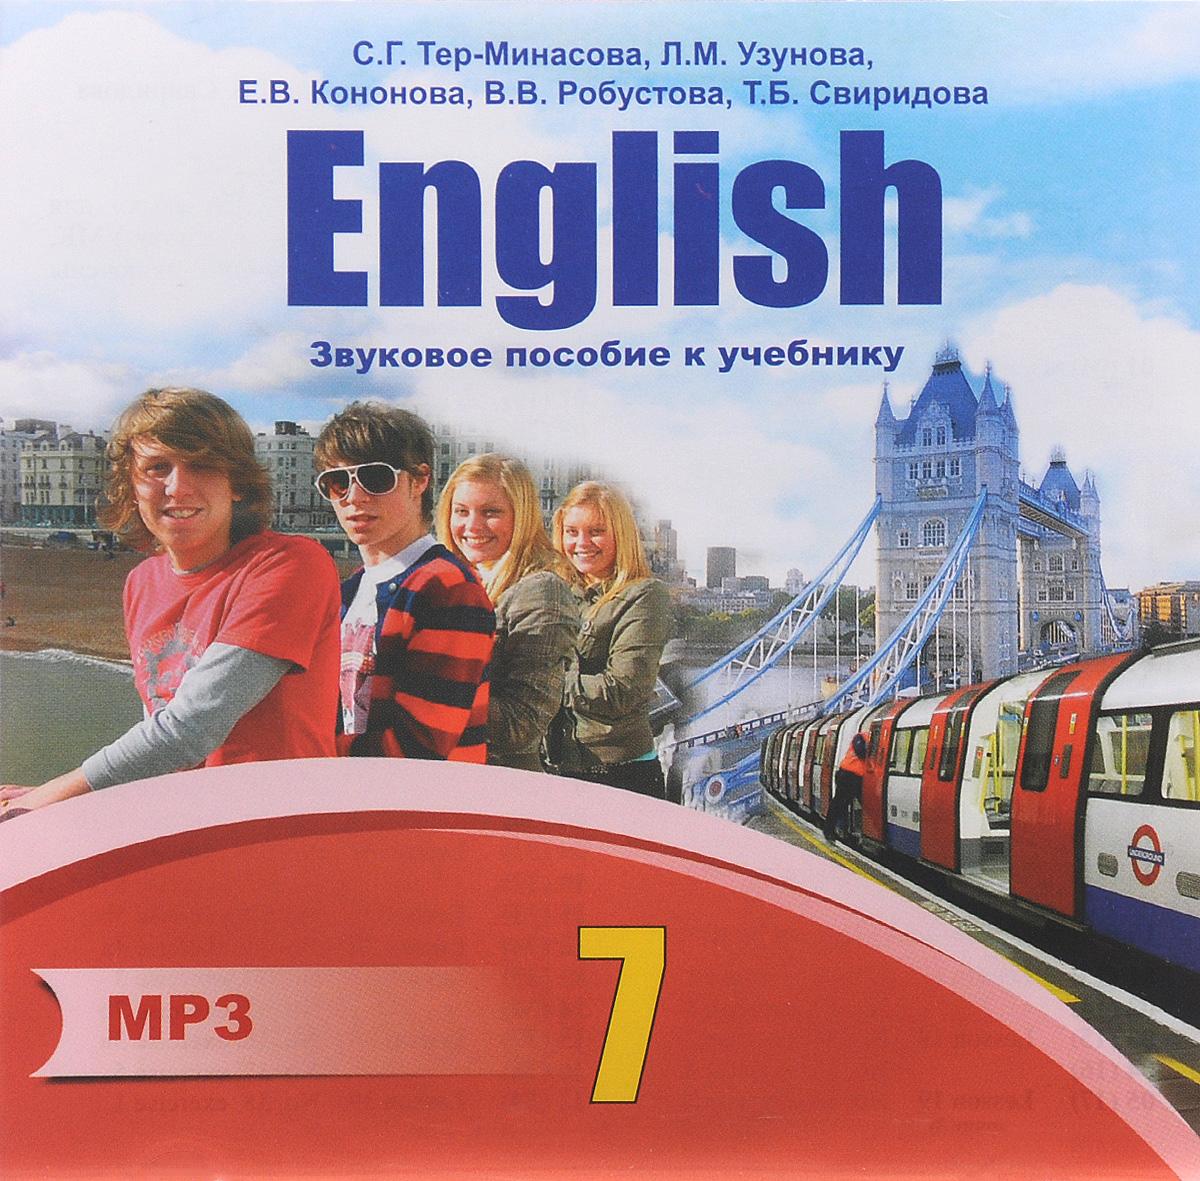 English 7 / Английский язык. 7 класс. Звуковое пособие к учебнику (аудиокурс на MP3)